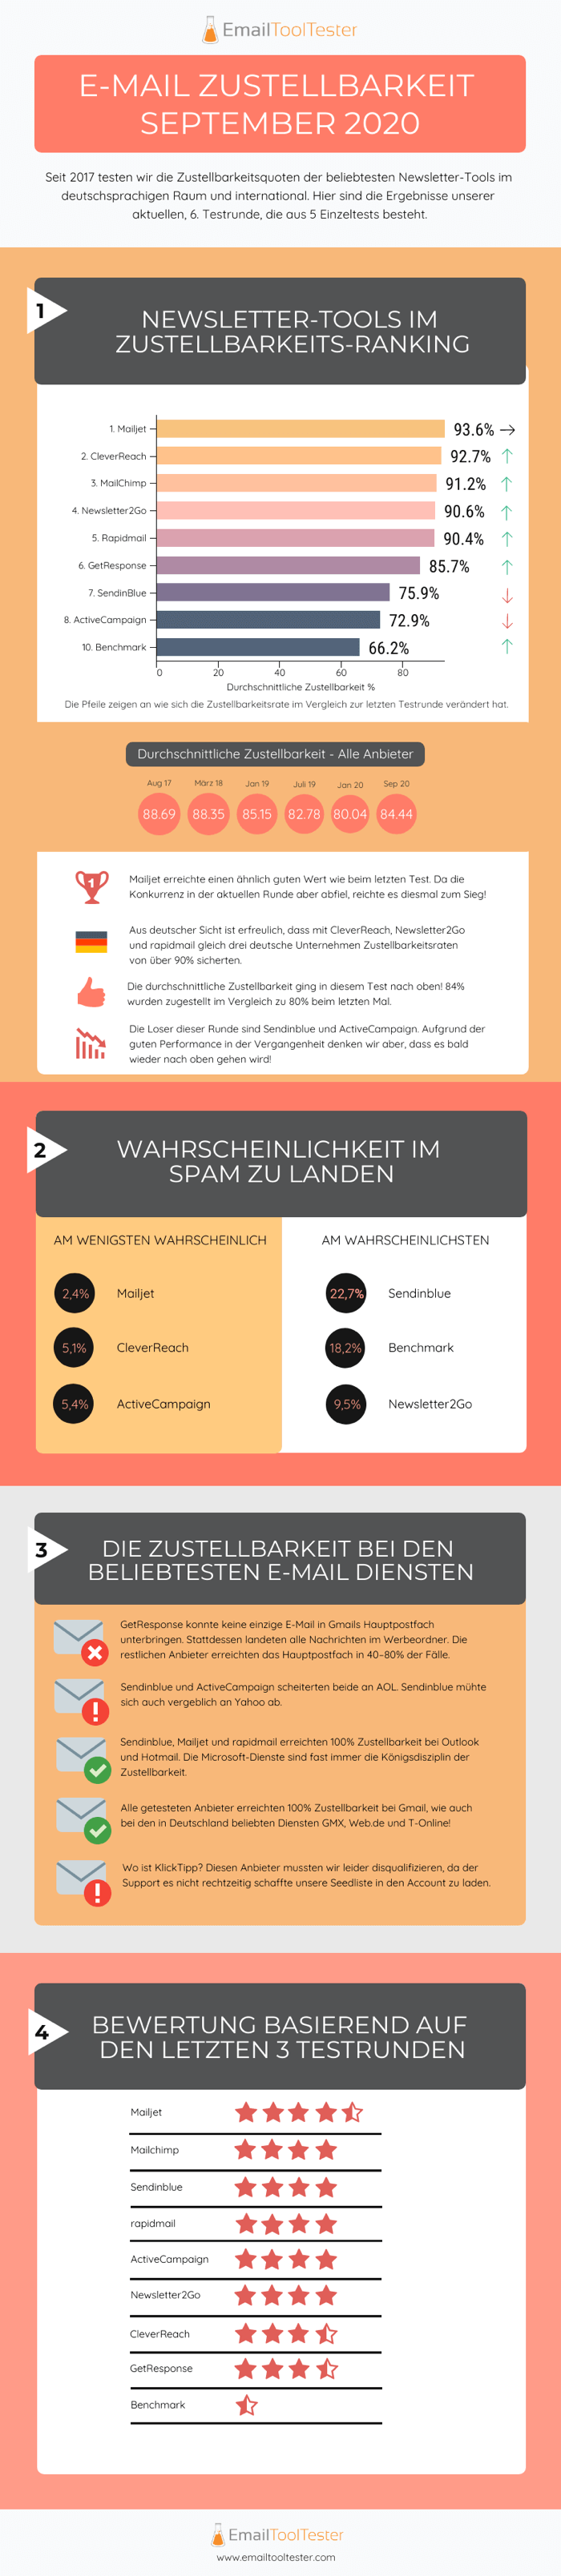 infografik zustellbarkeit